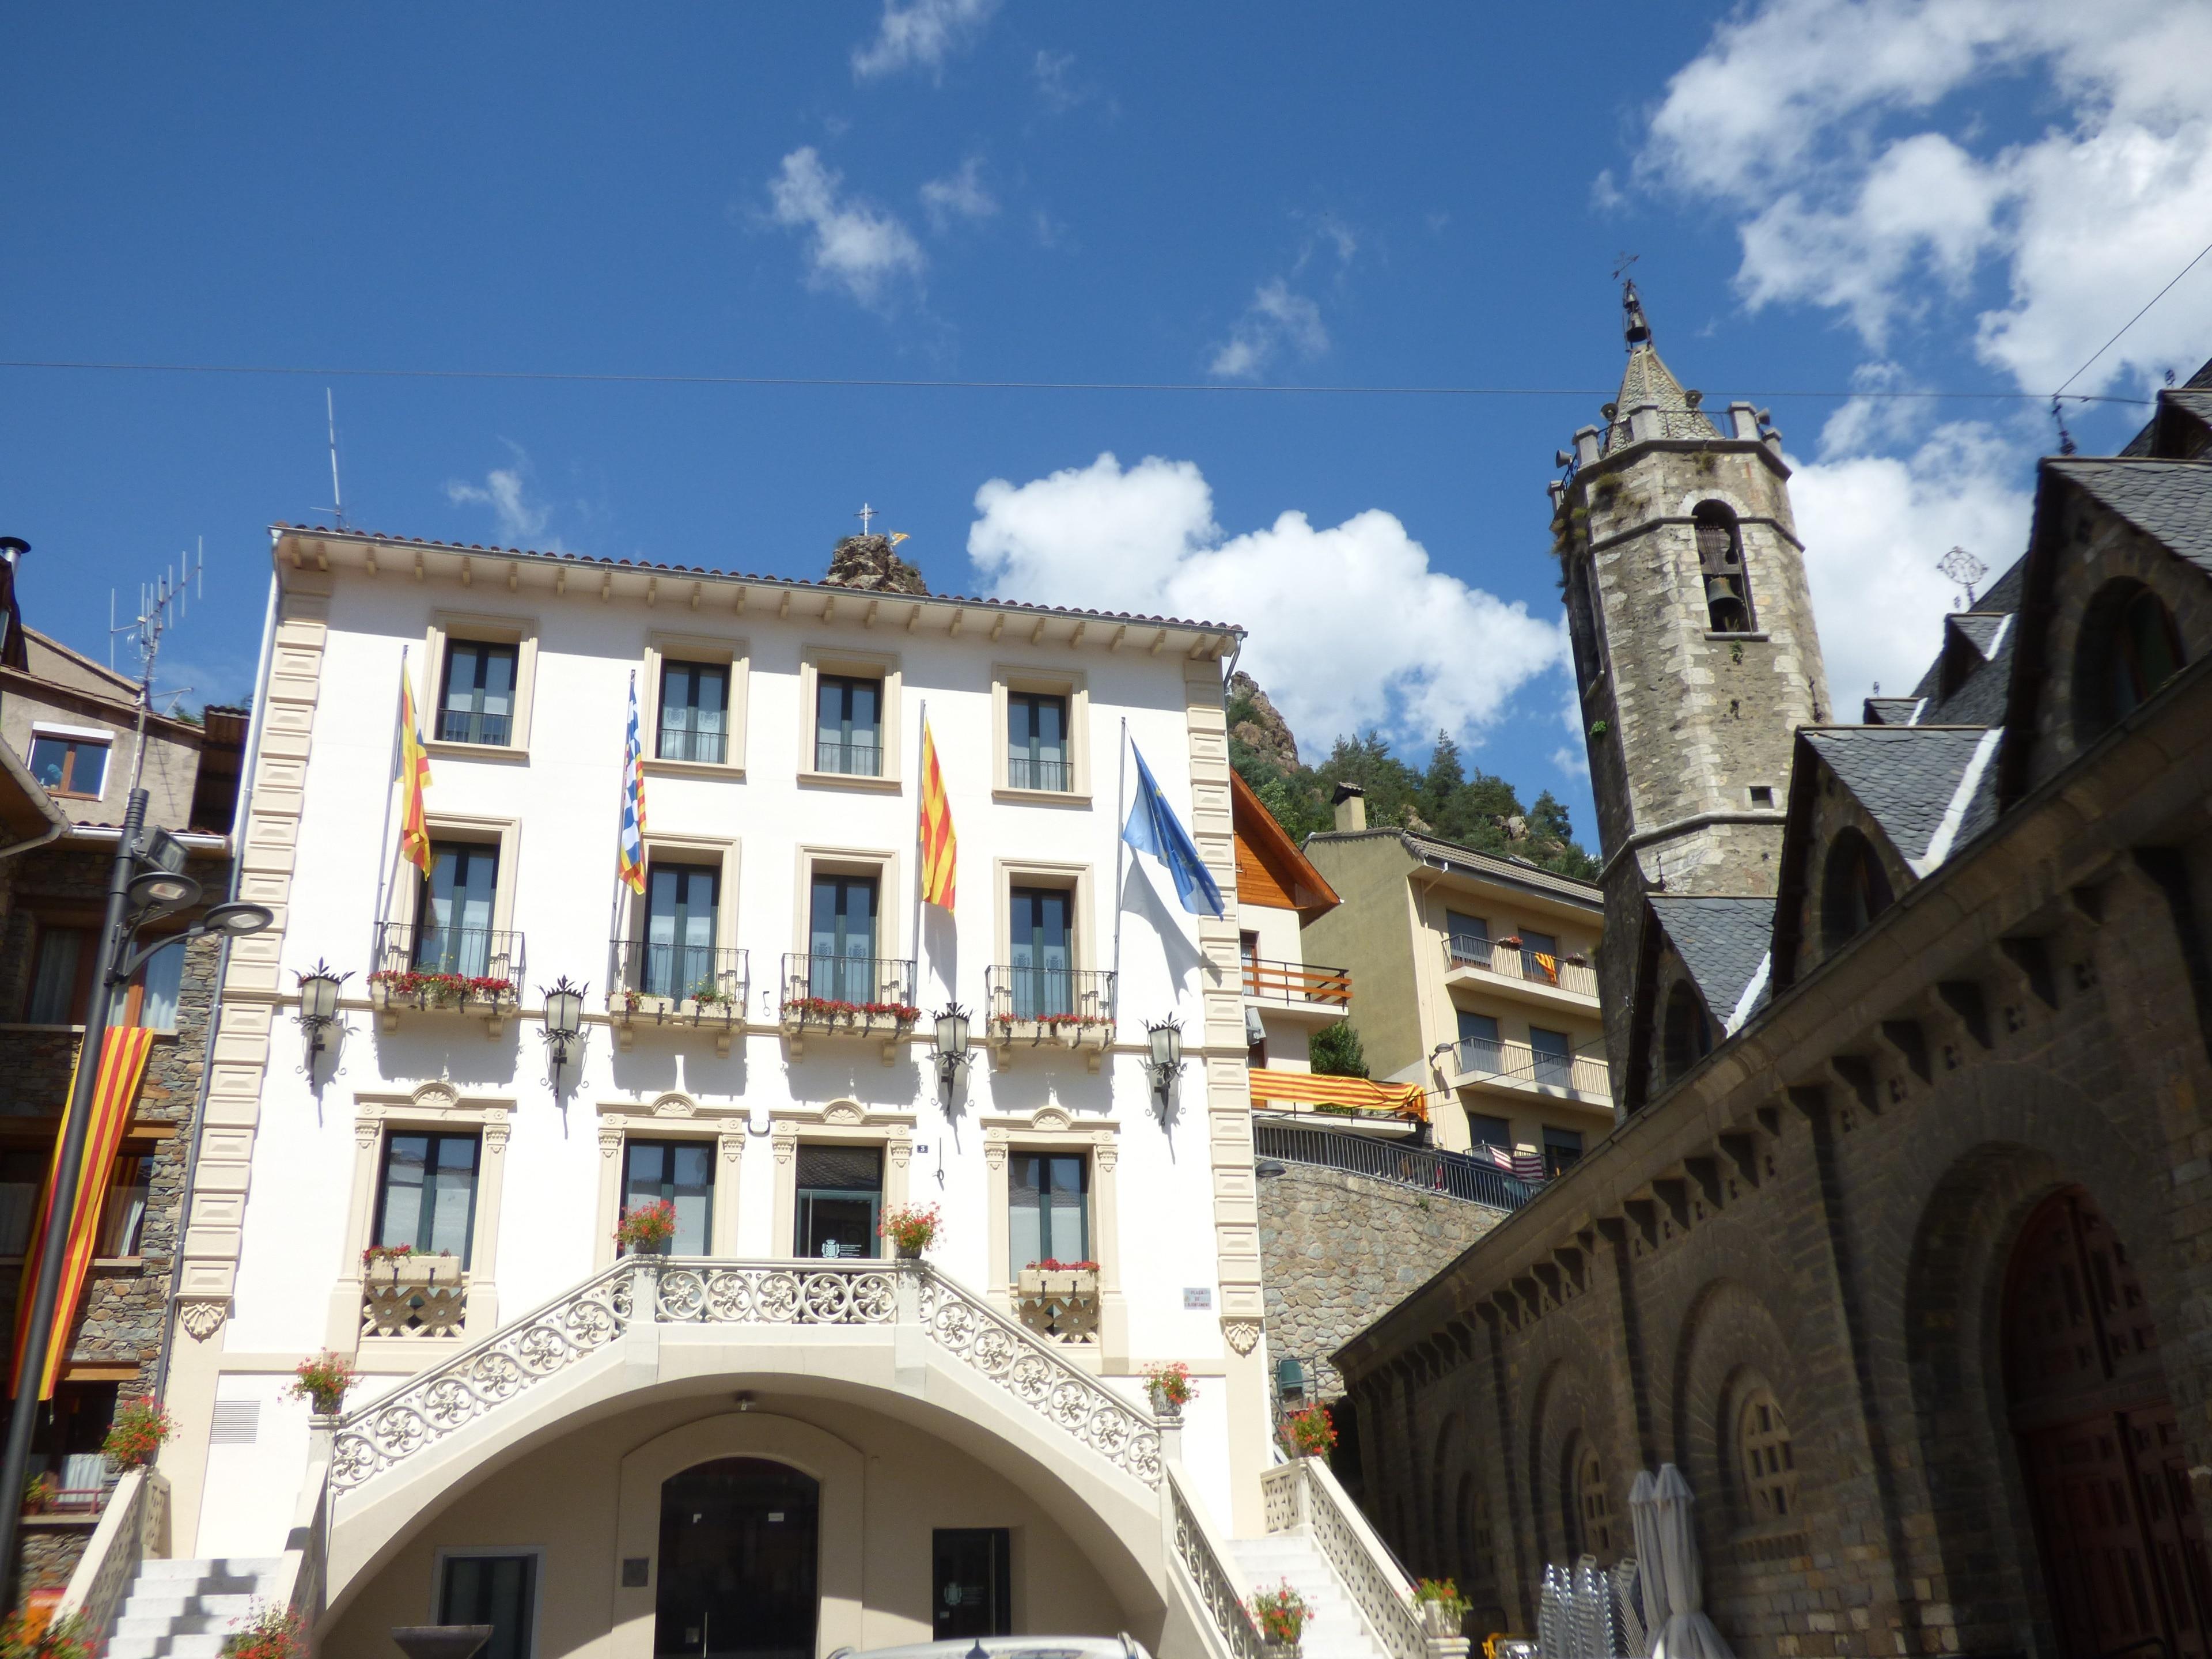 Ripollès, Catalonia, Spain